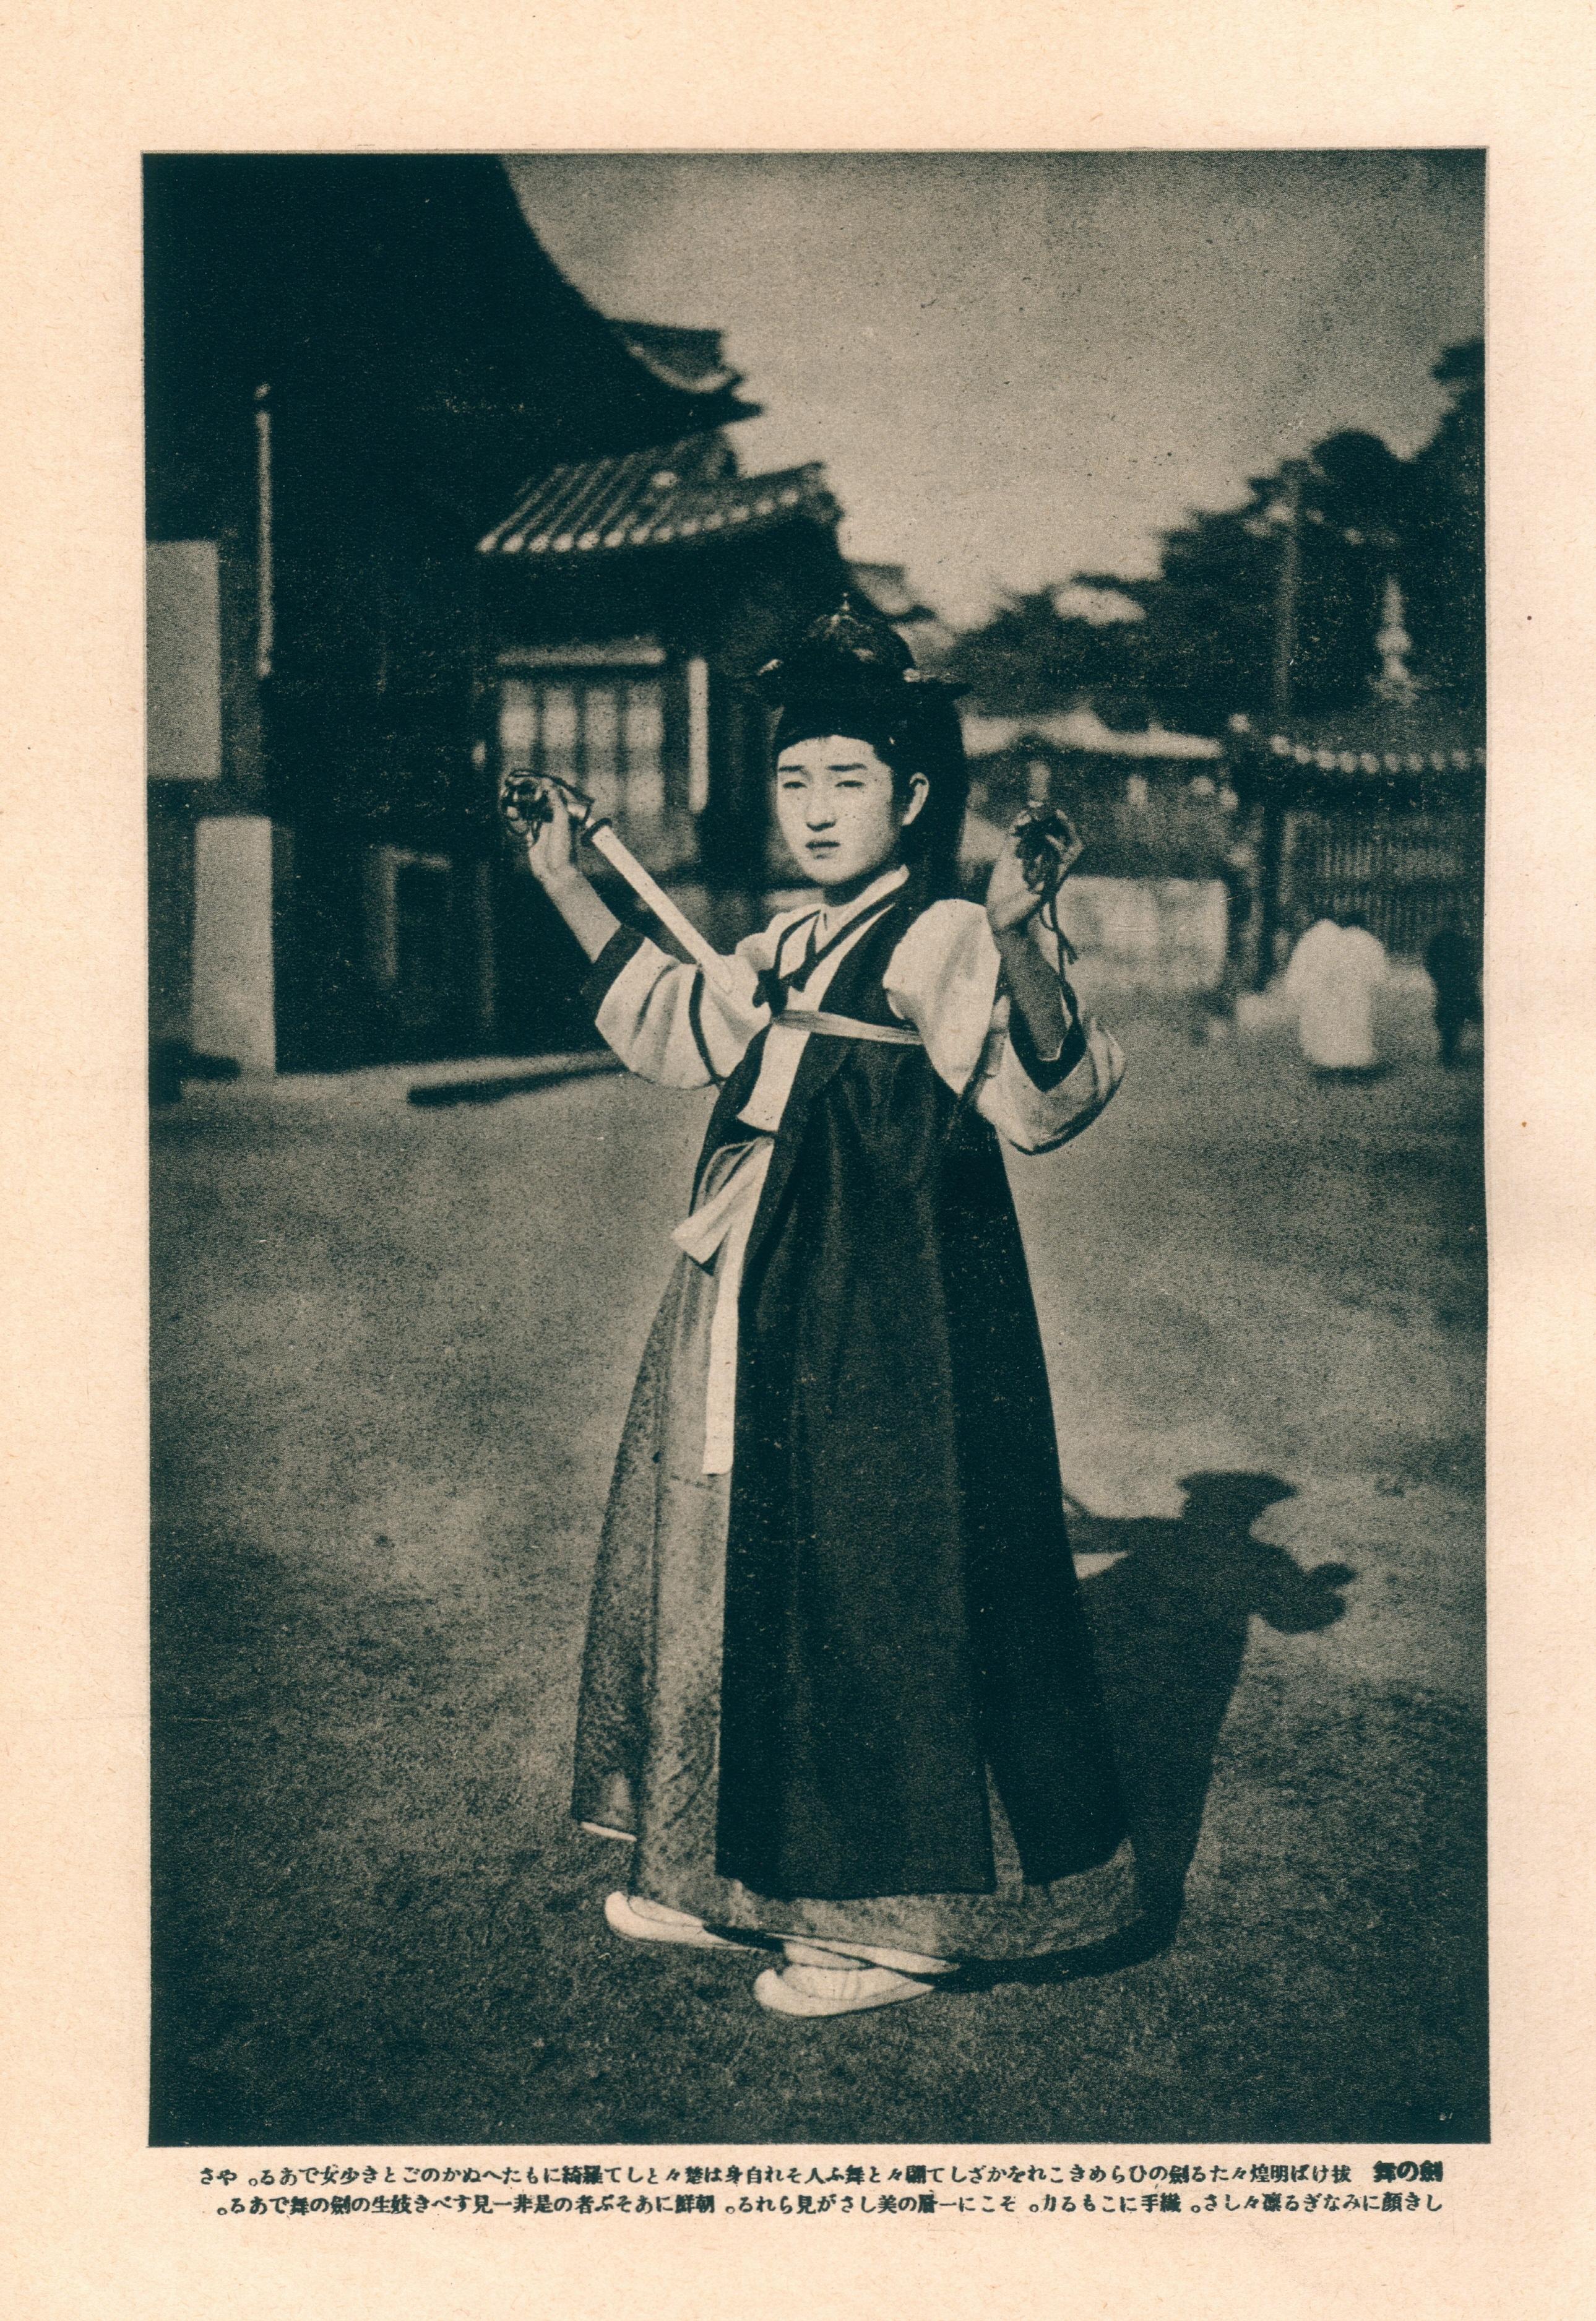 http://archive.museum.seoul.kr:8090/ARCHIVE_DATA/master/1011/A000000247/a2d57970-4864-4825-bece-c987ebf28a1a.jpg